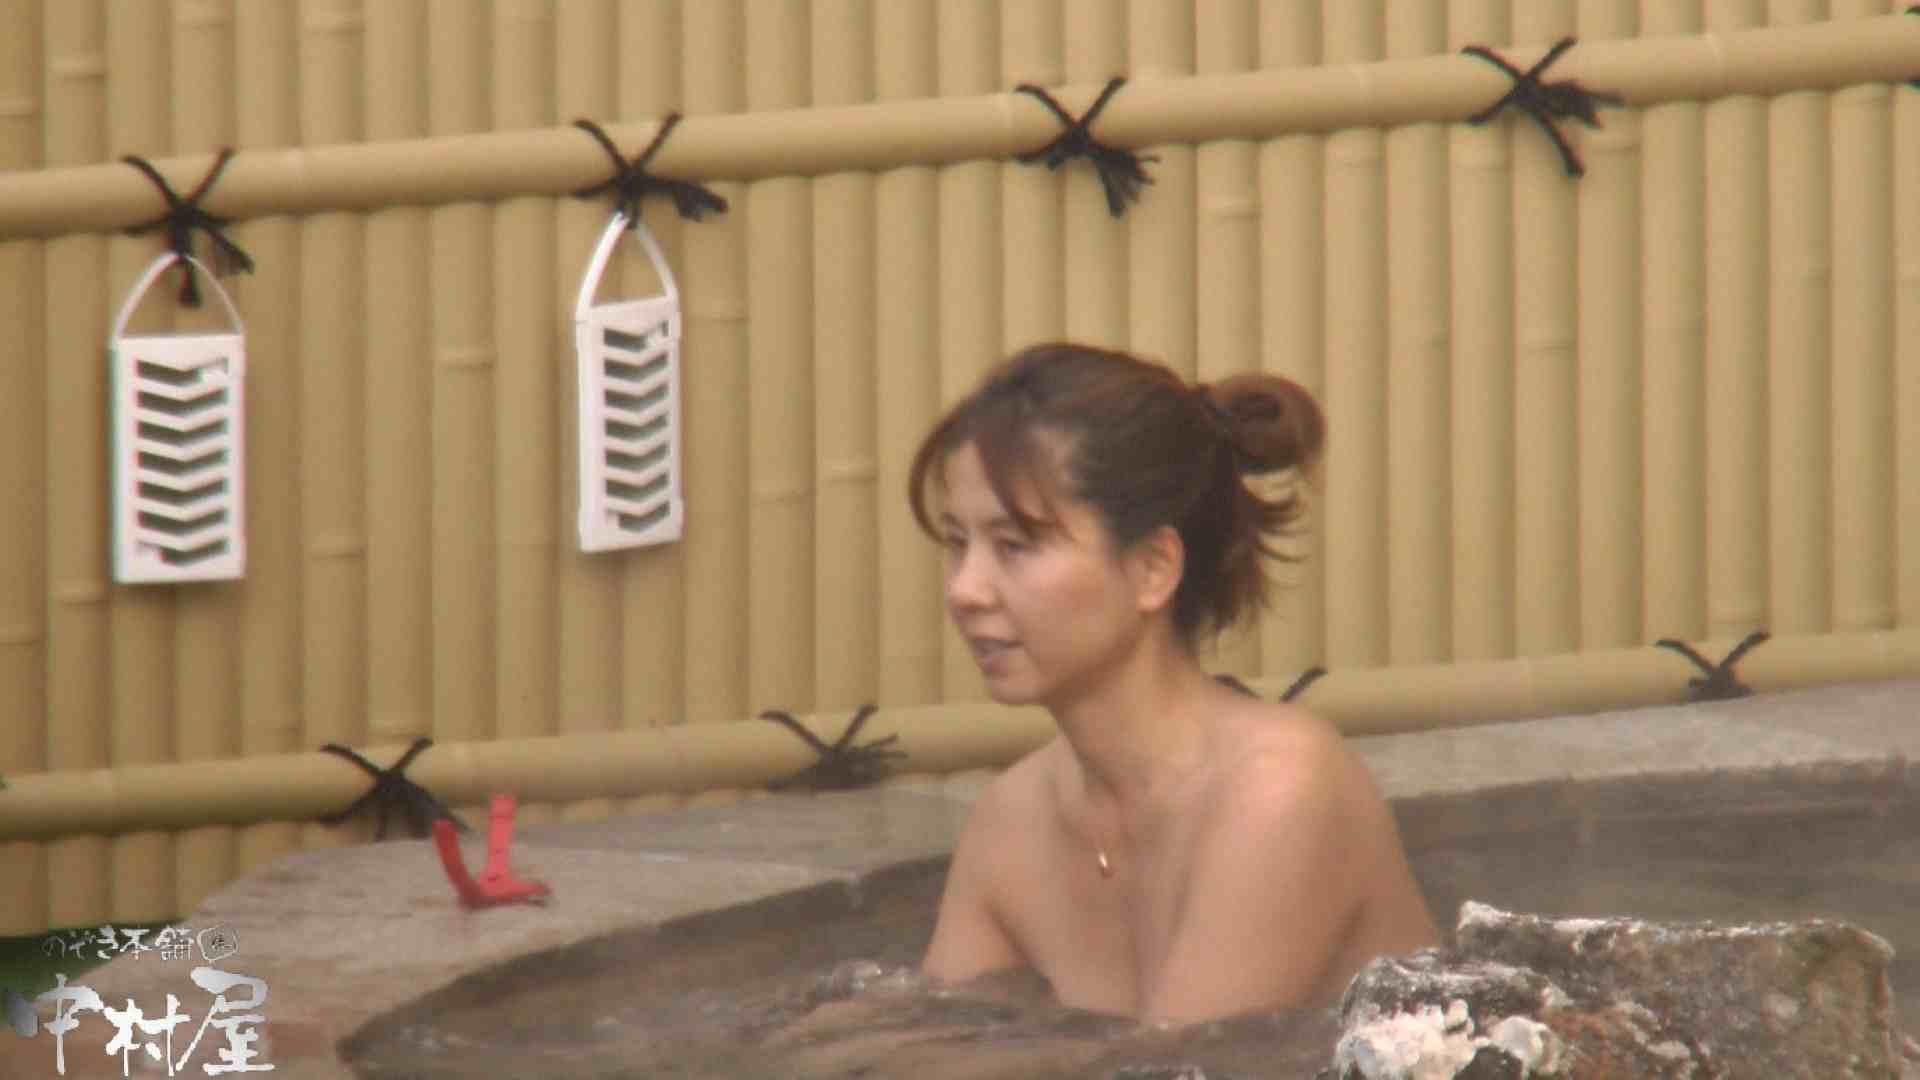 Aquaな露天風呂Vol.915 OLすけべ画像 オマンコ動画キャプチャ 99連発 38